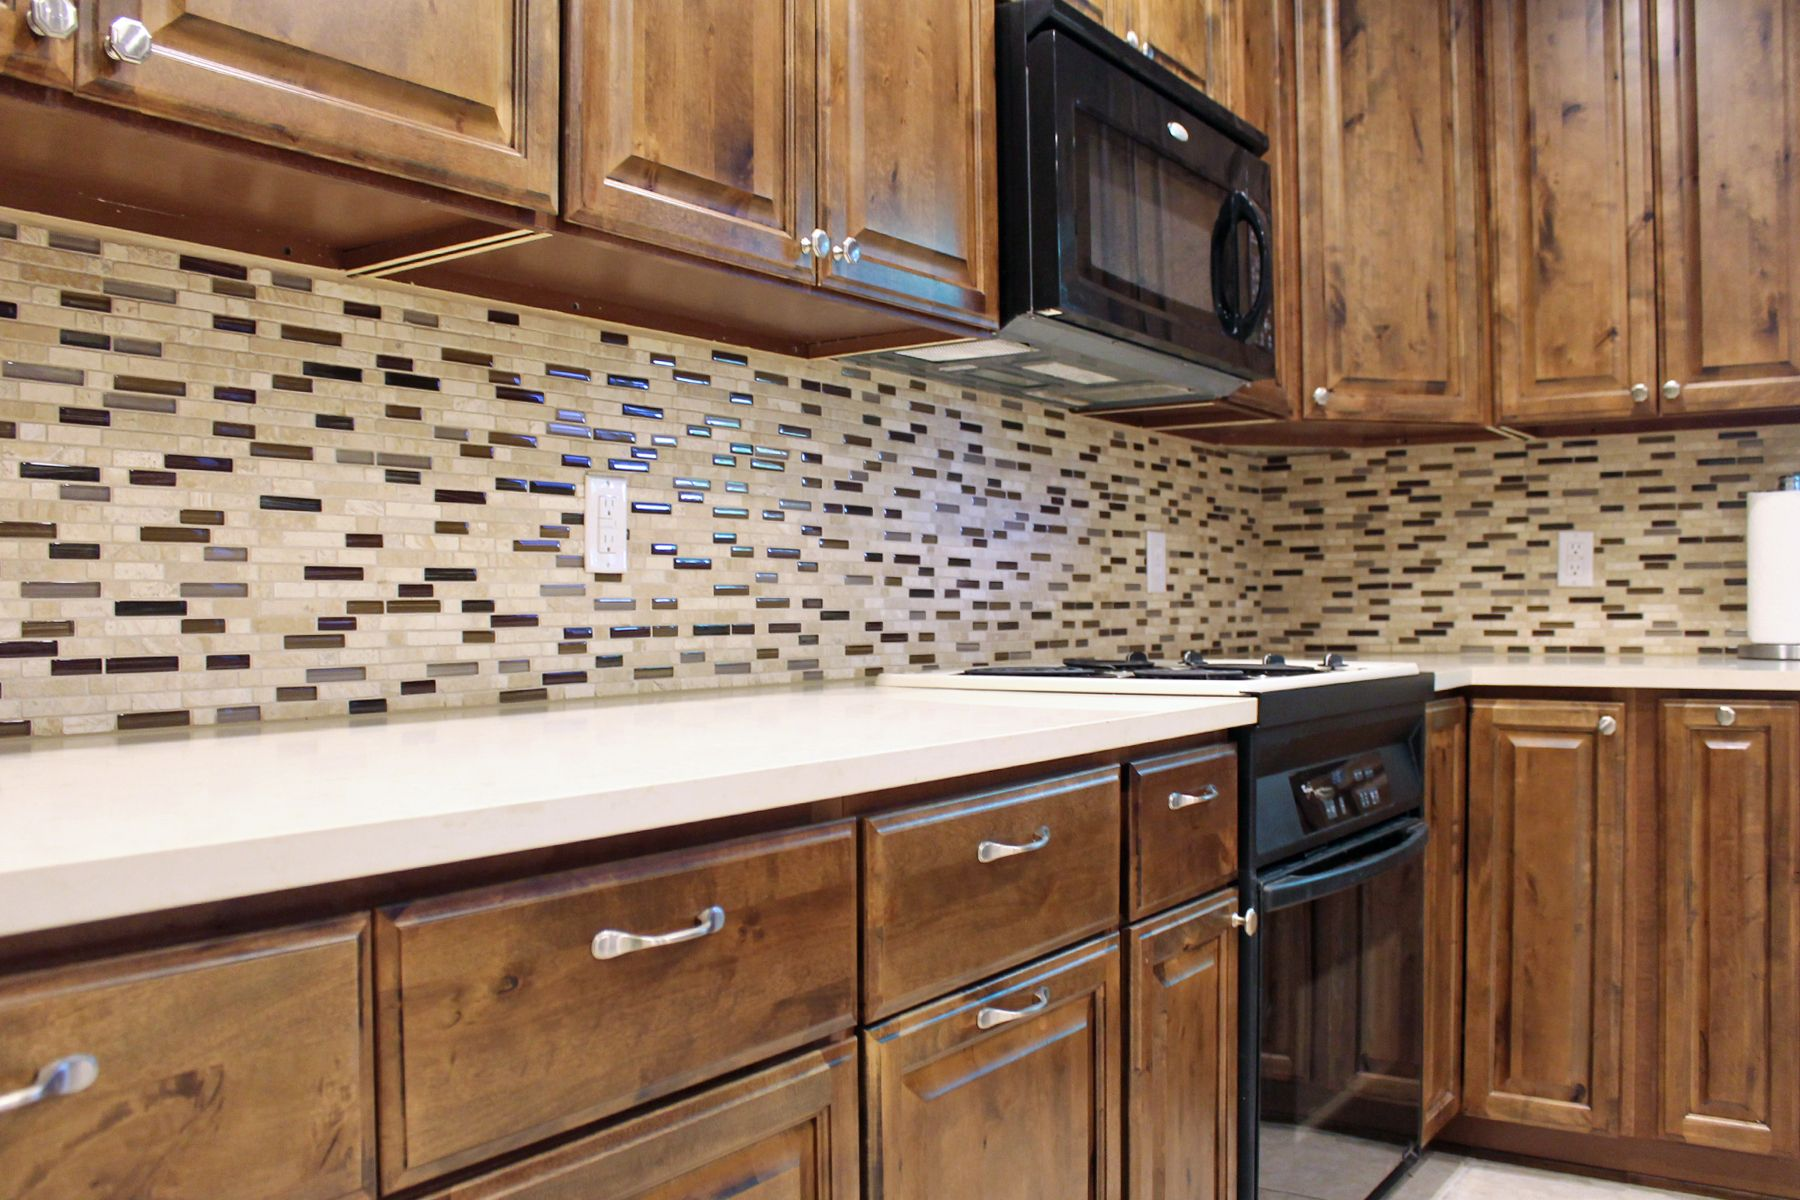 Kitchen Design Dark Brown Rustic Cabinets White Quartz Countertops Mosaic Tile Backsplash Remodeling Rustic Cabinets White Quartz Countertop Kitchen